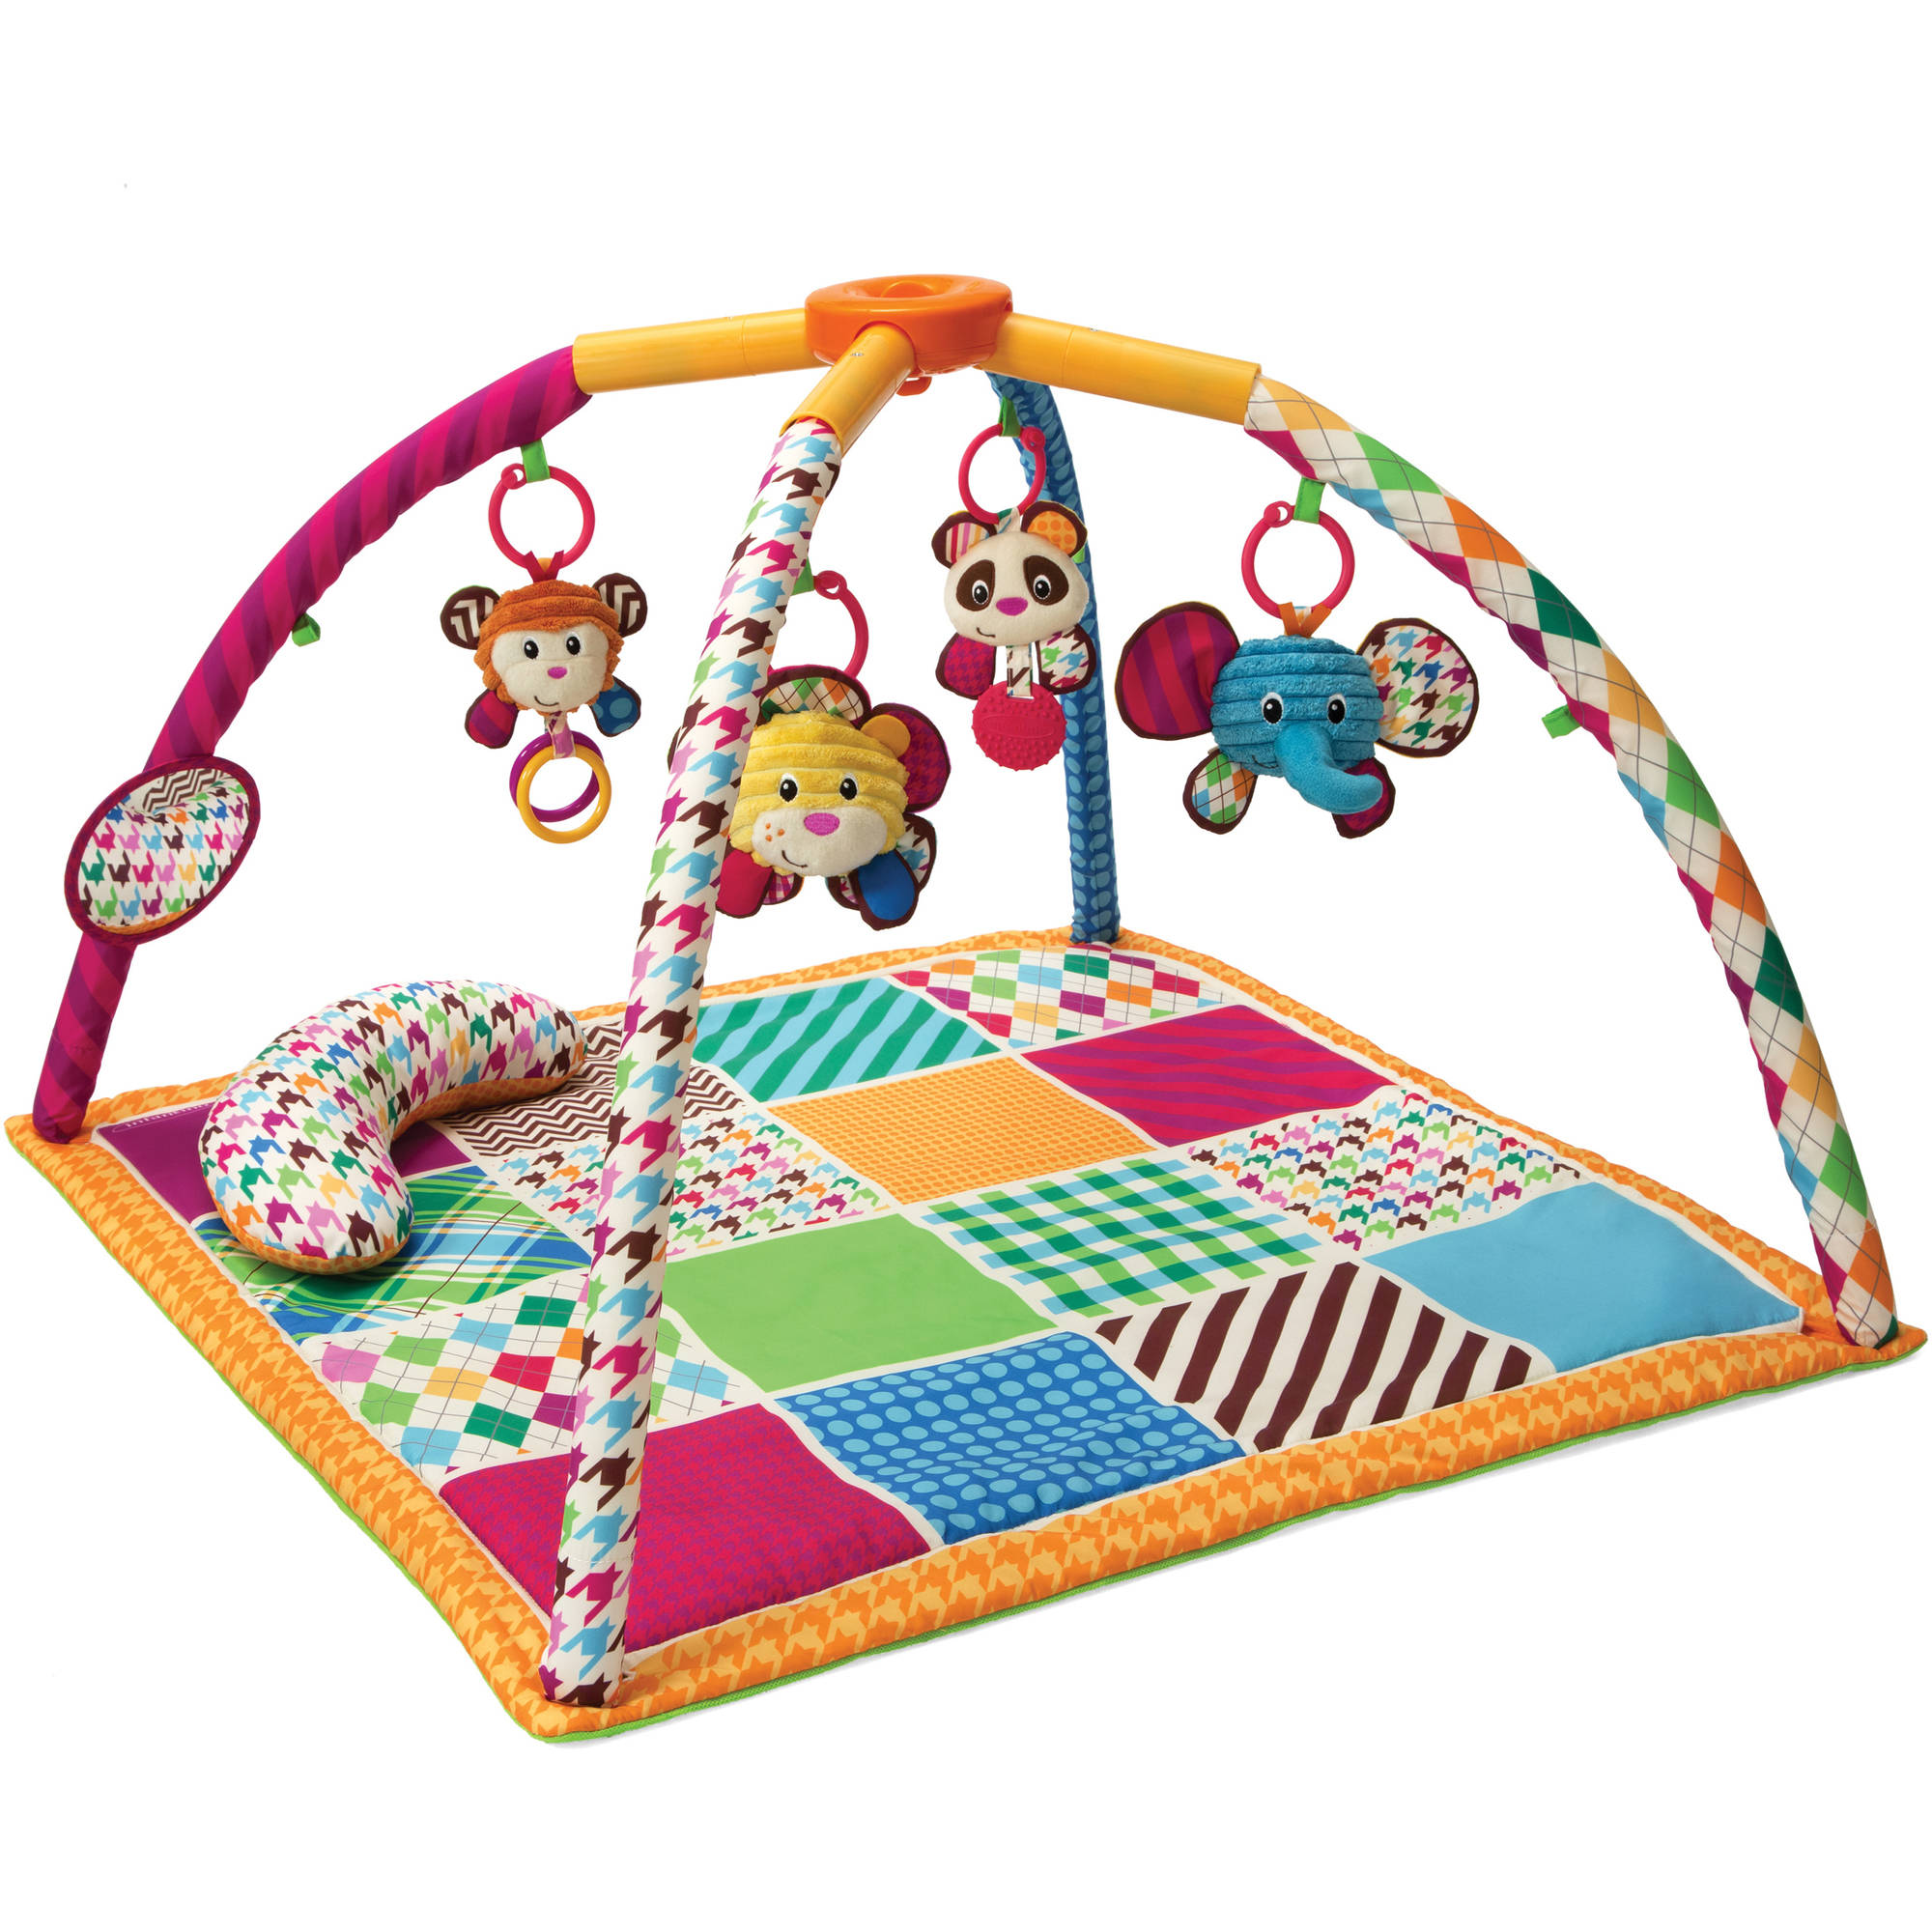 Infantino See Play Go Safari Fun Twist & Fold Activity Gym & Play Mat